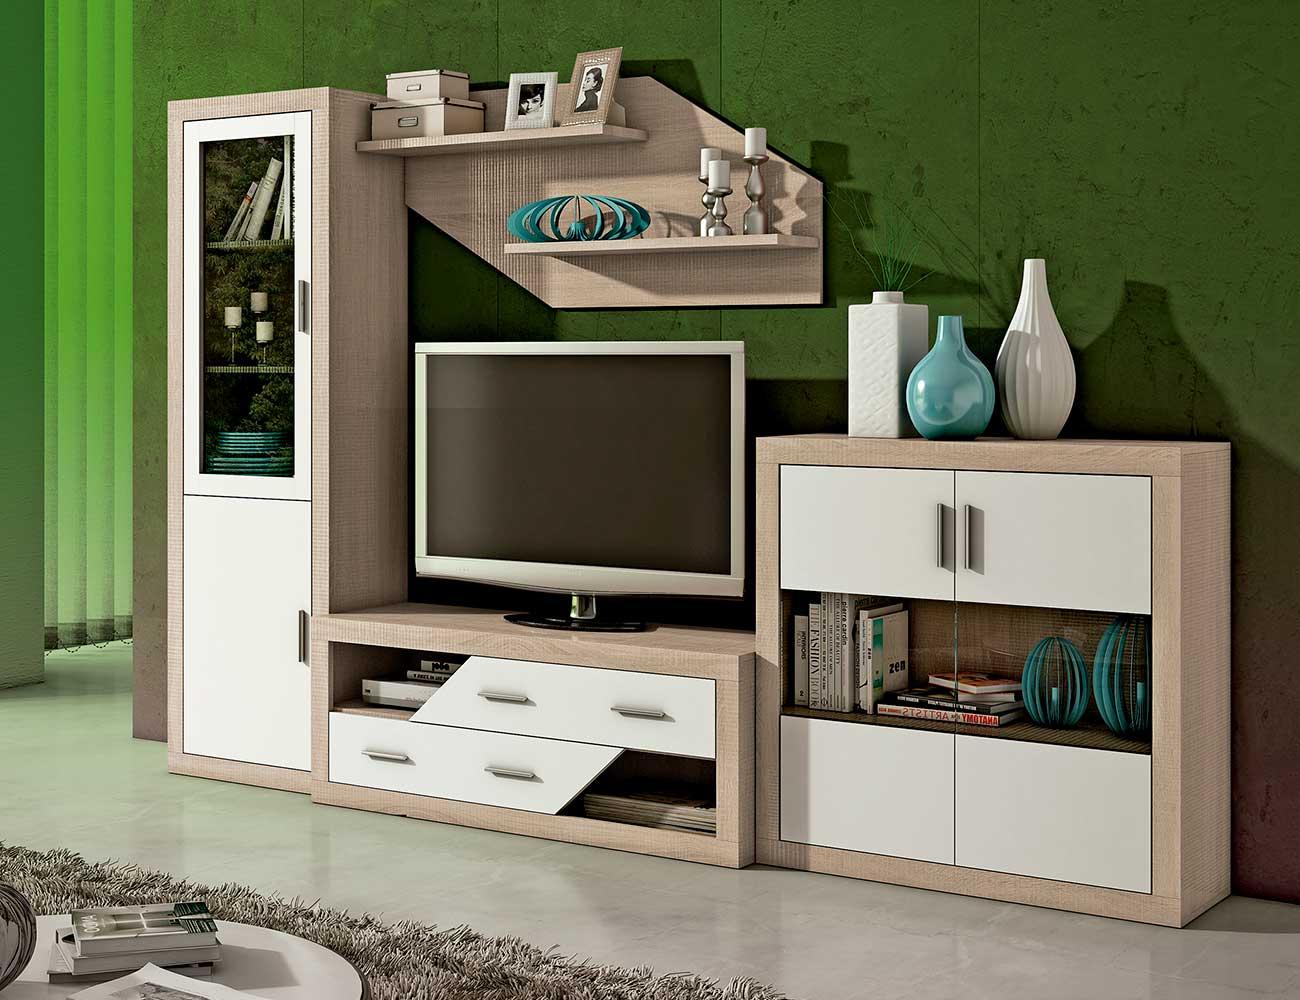 Mueble salon moderno bodeguero vitrina cambrian blanco 300 cm